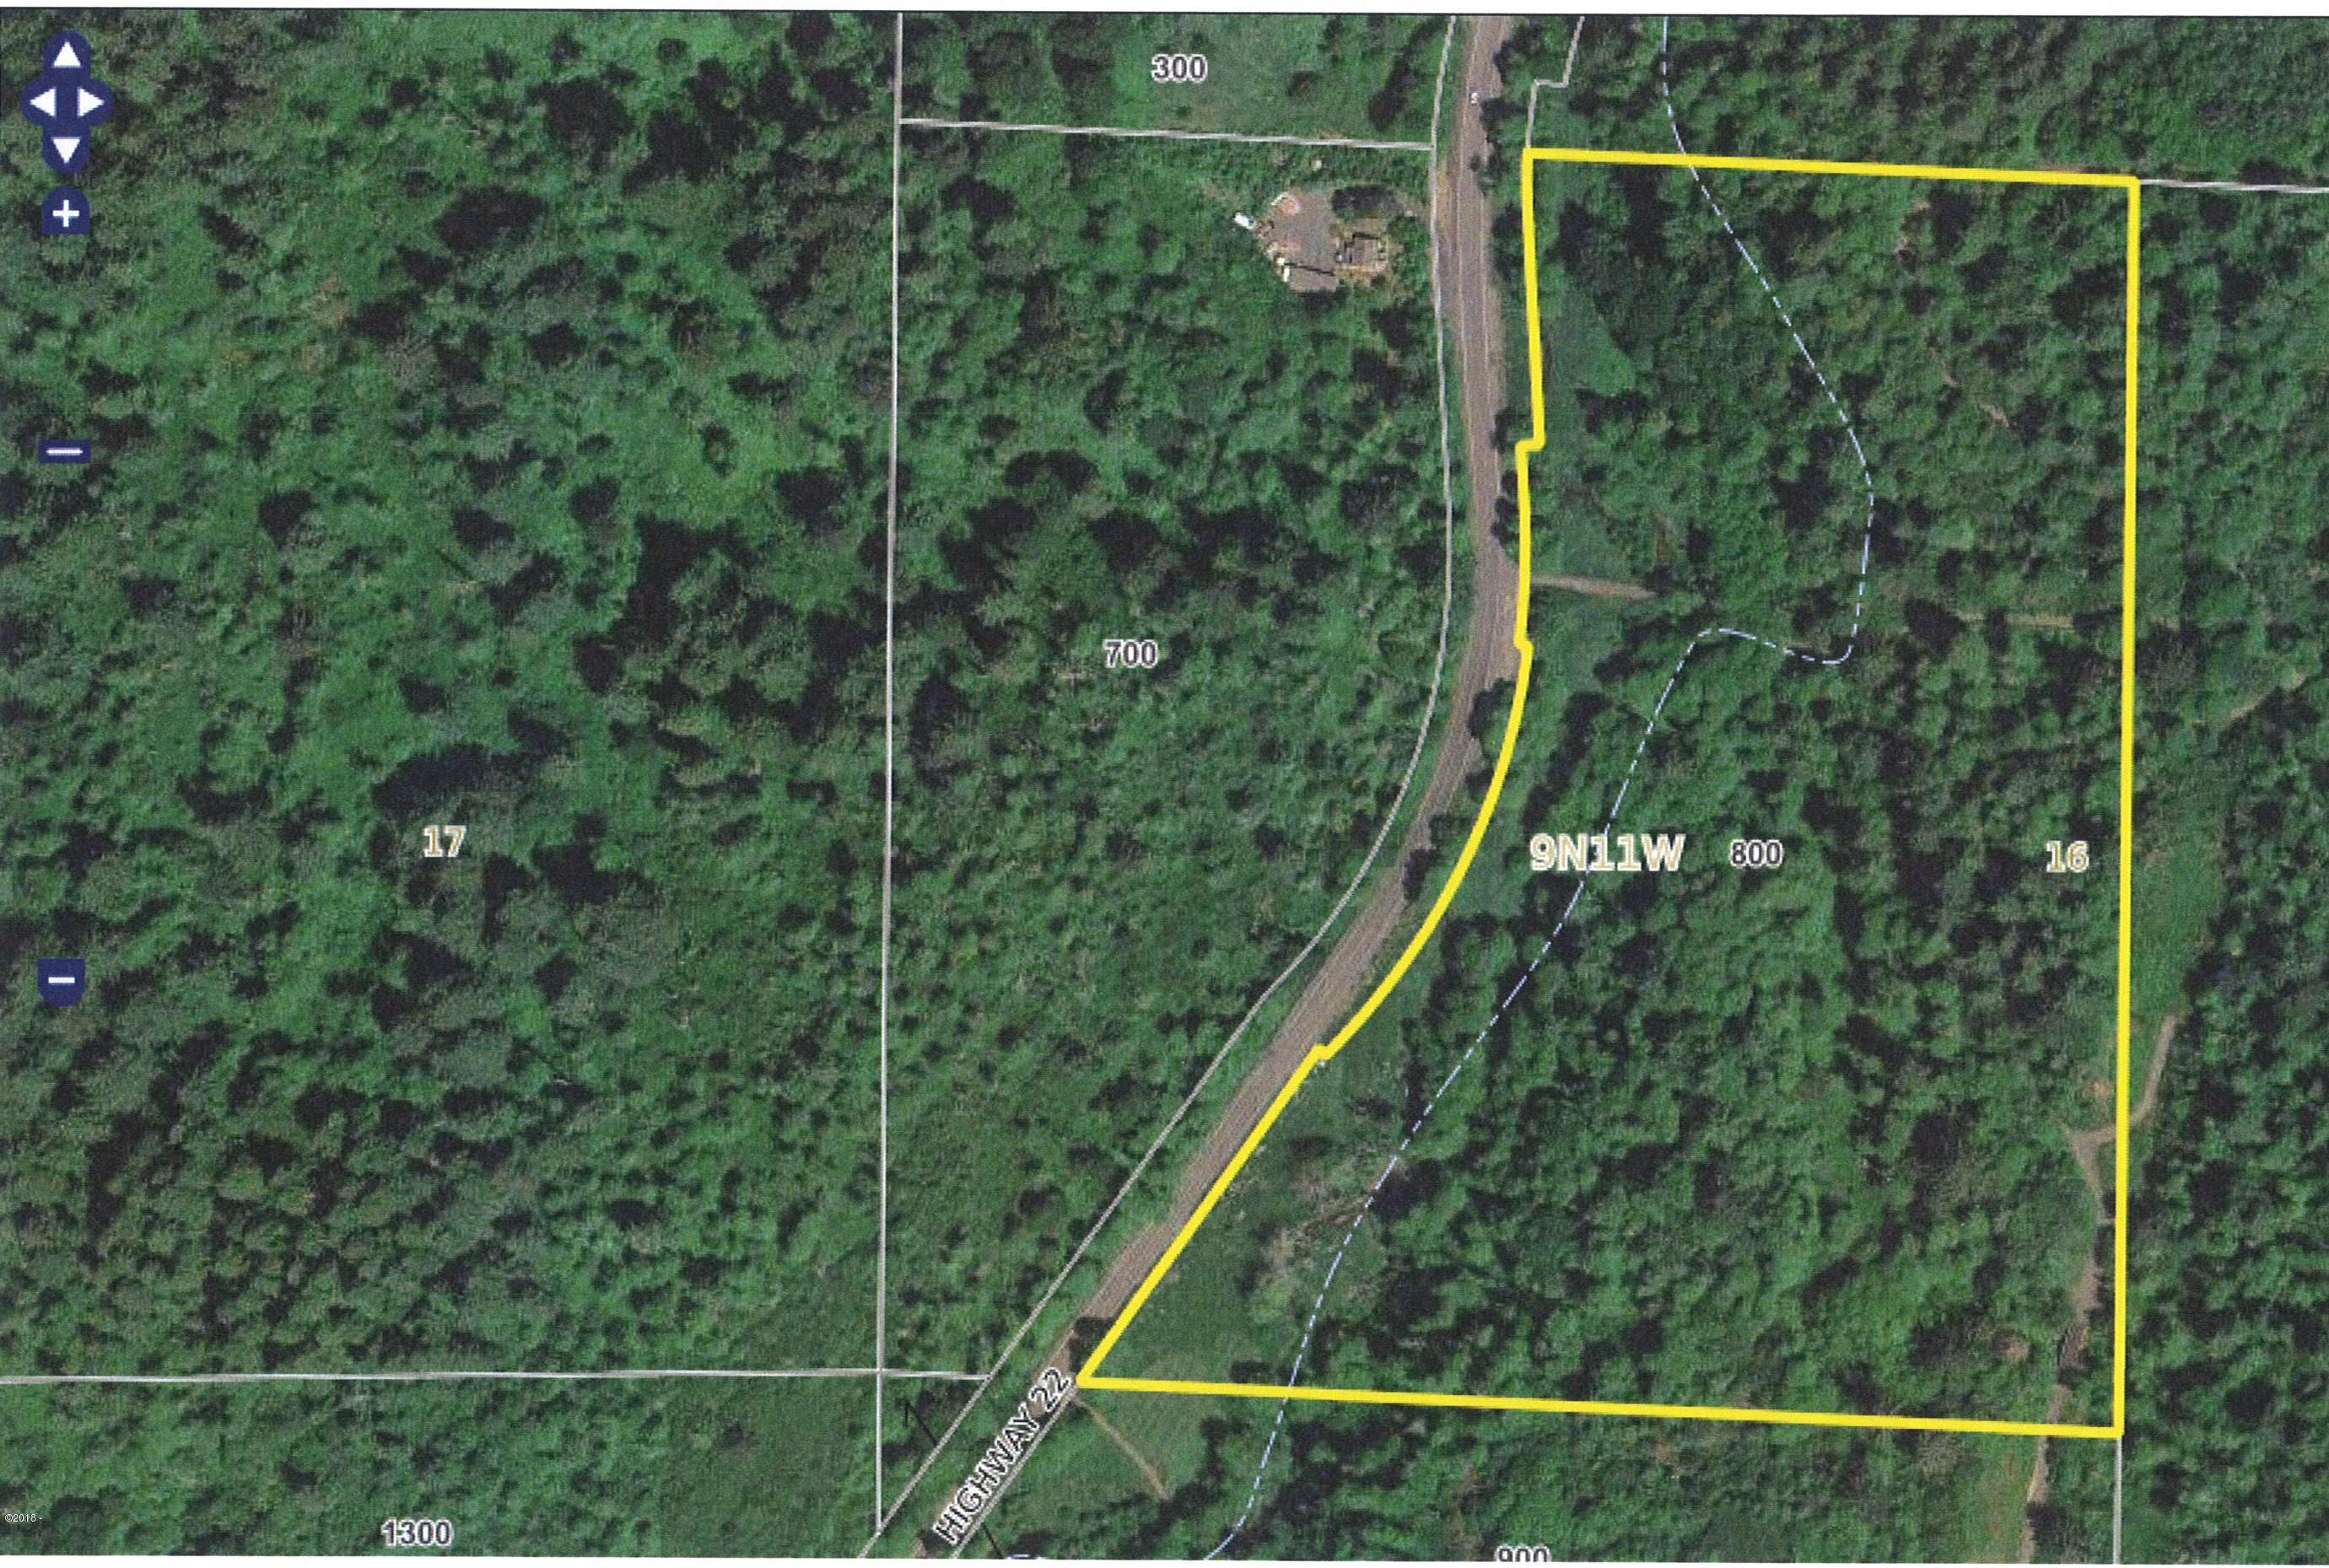 TM 5s09000000800, Hebo, OR 97122 - Tillamook County GIS Map Aerial